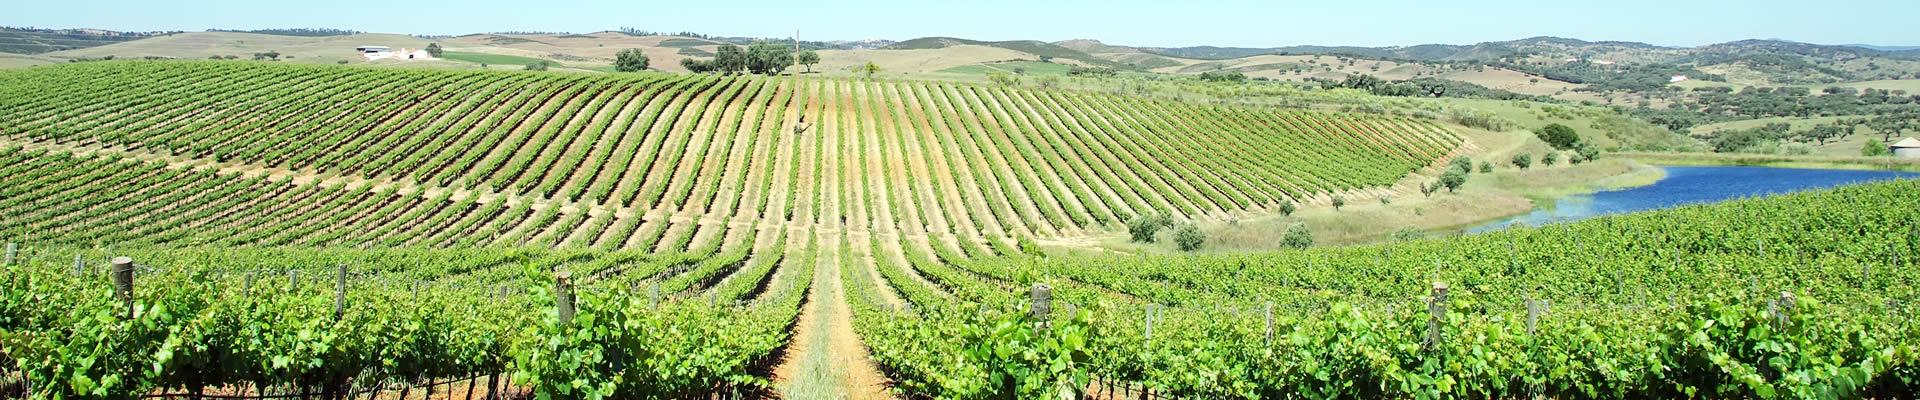 Portugese vineyards